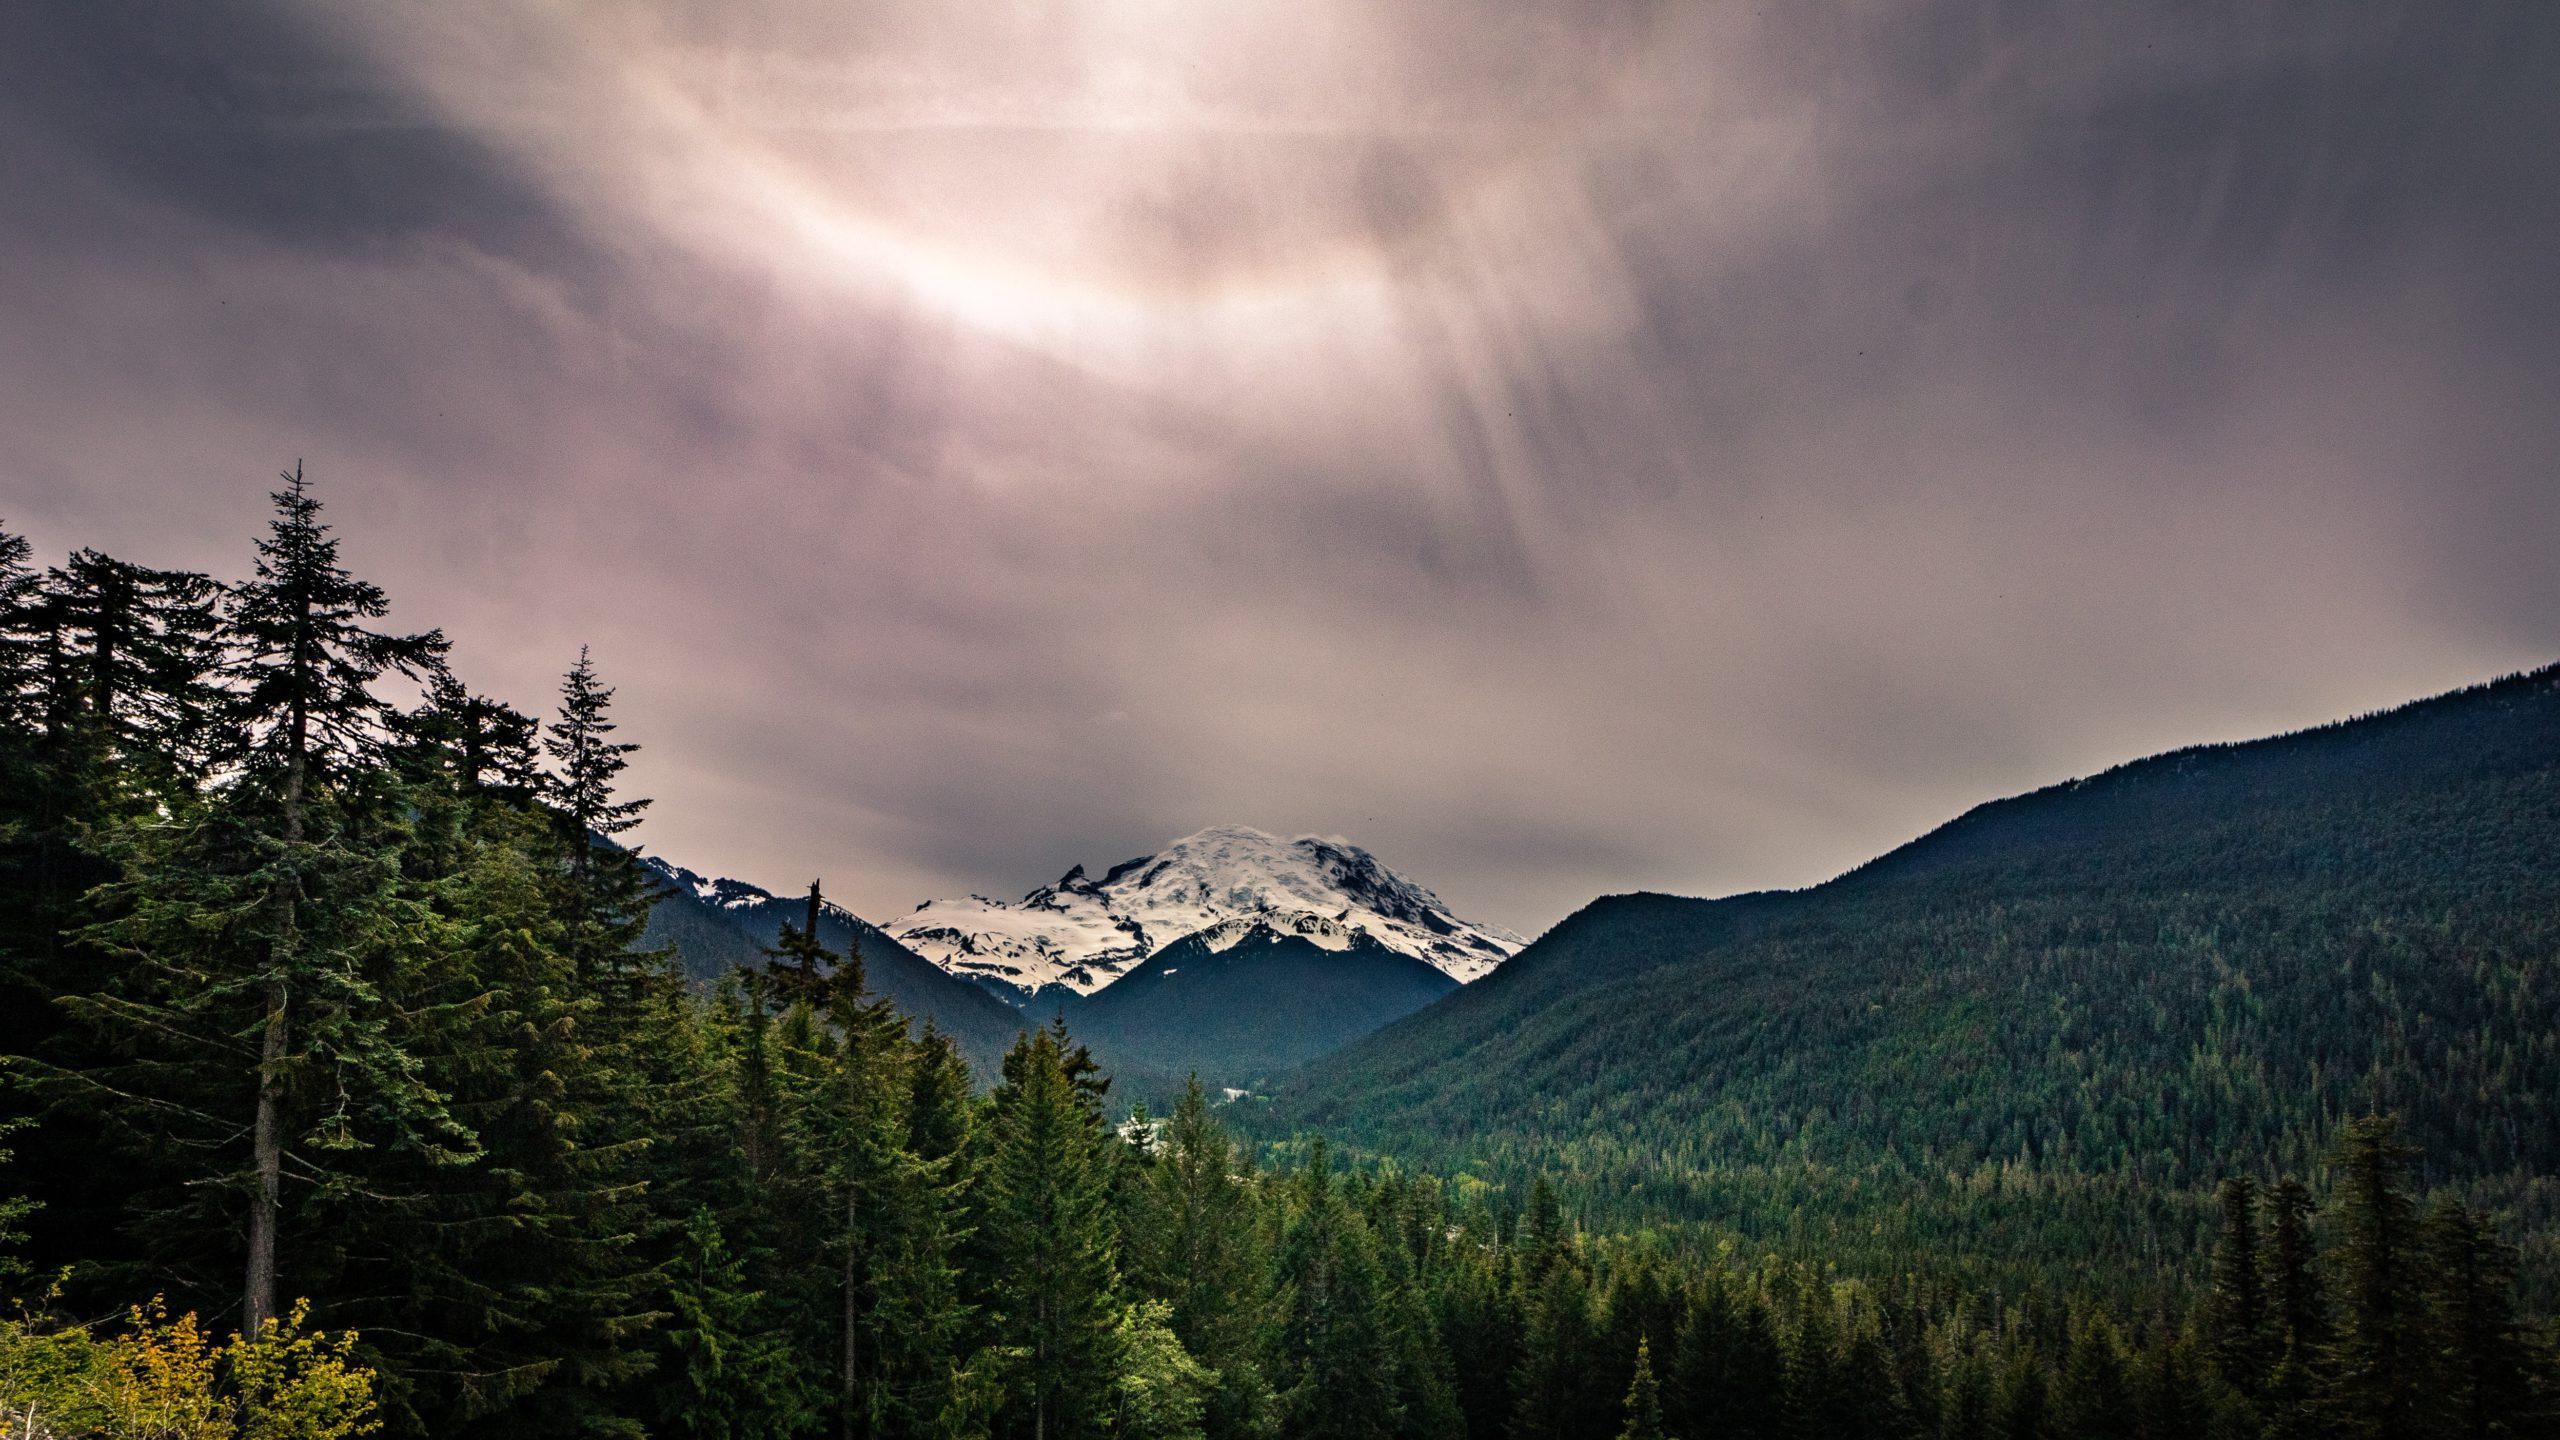 Mount Rainer in Washington State